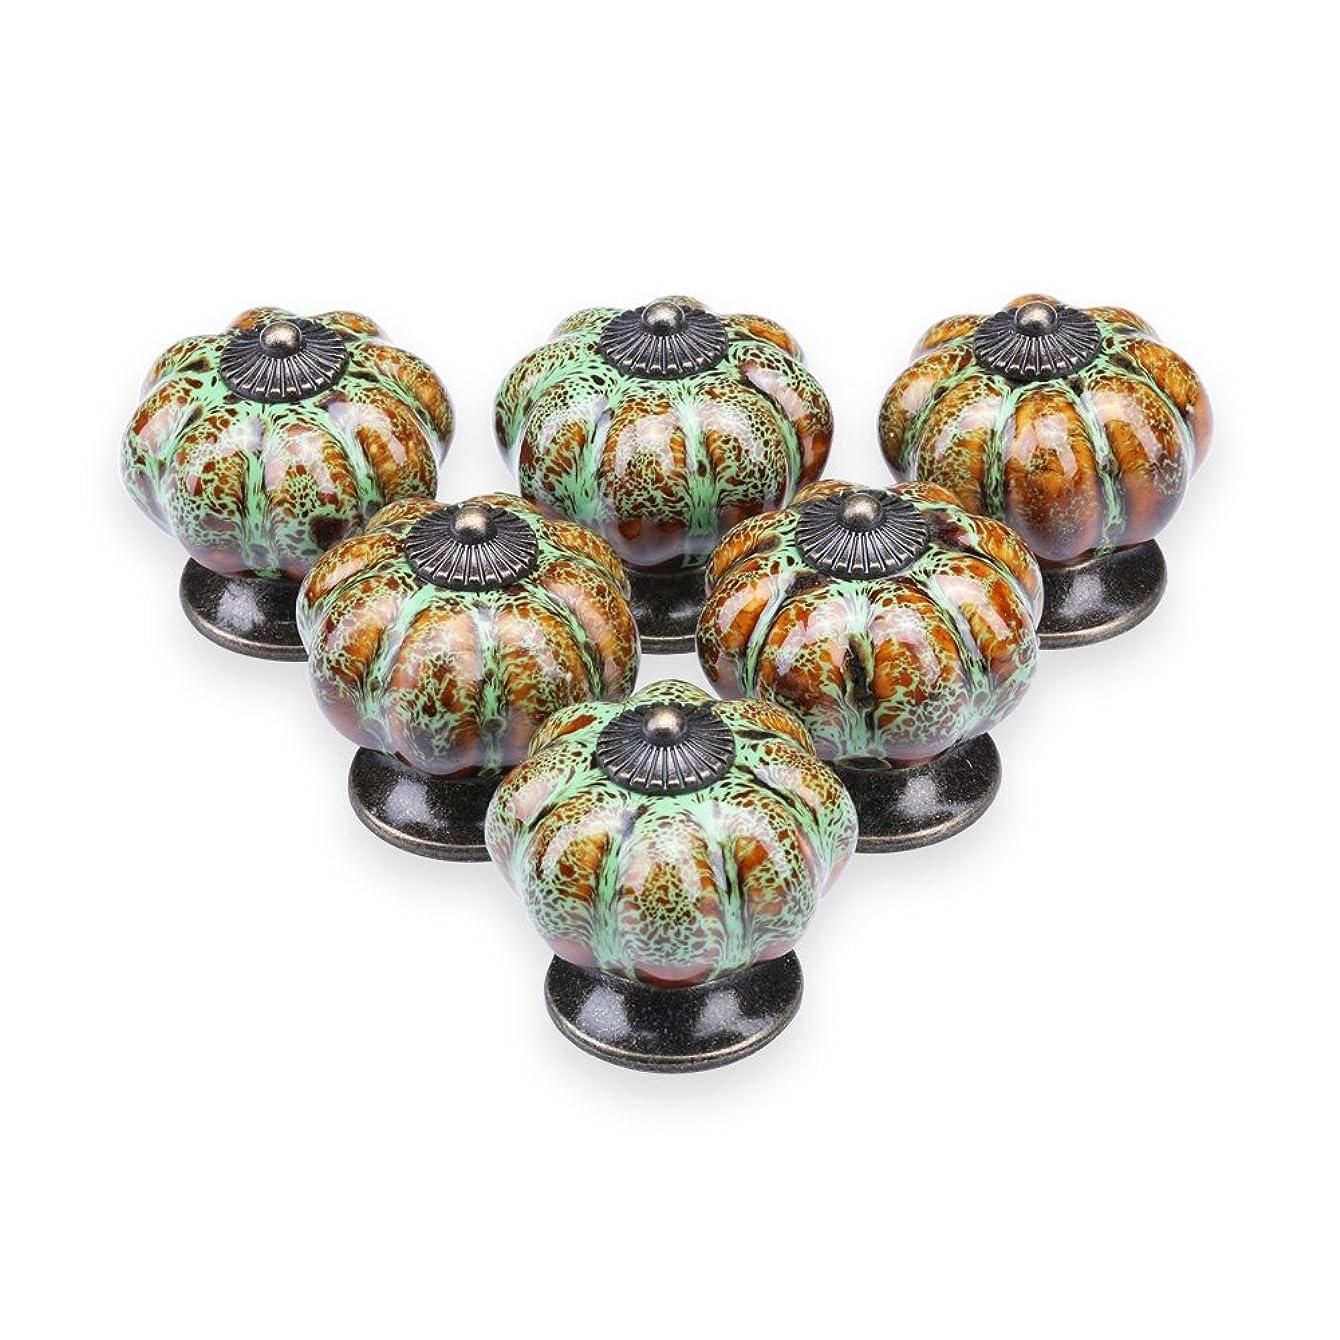 YDO Ceramic Glazed Pumpkin Knobs Classy Vintage Cabinet Door Pull Handle 6pcs (Green)